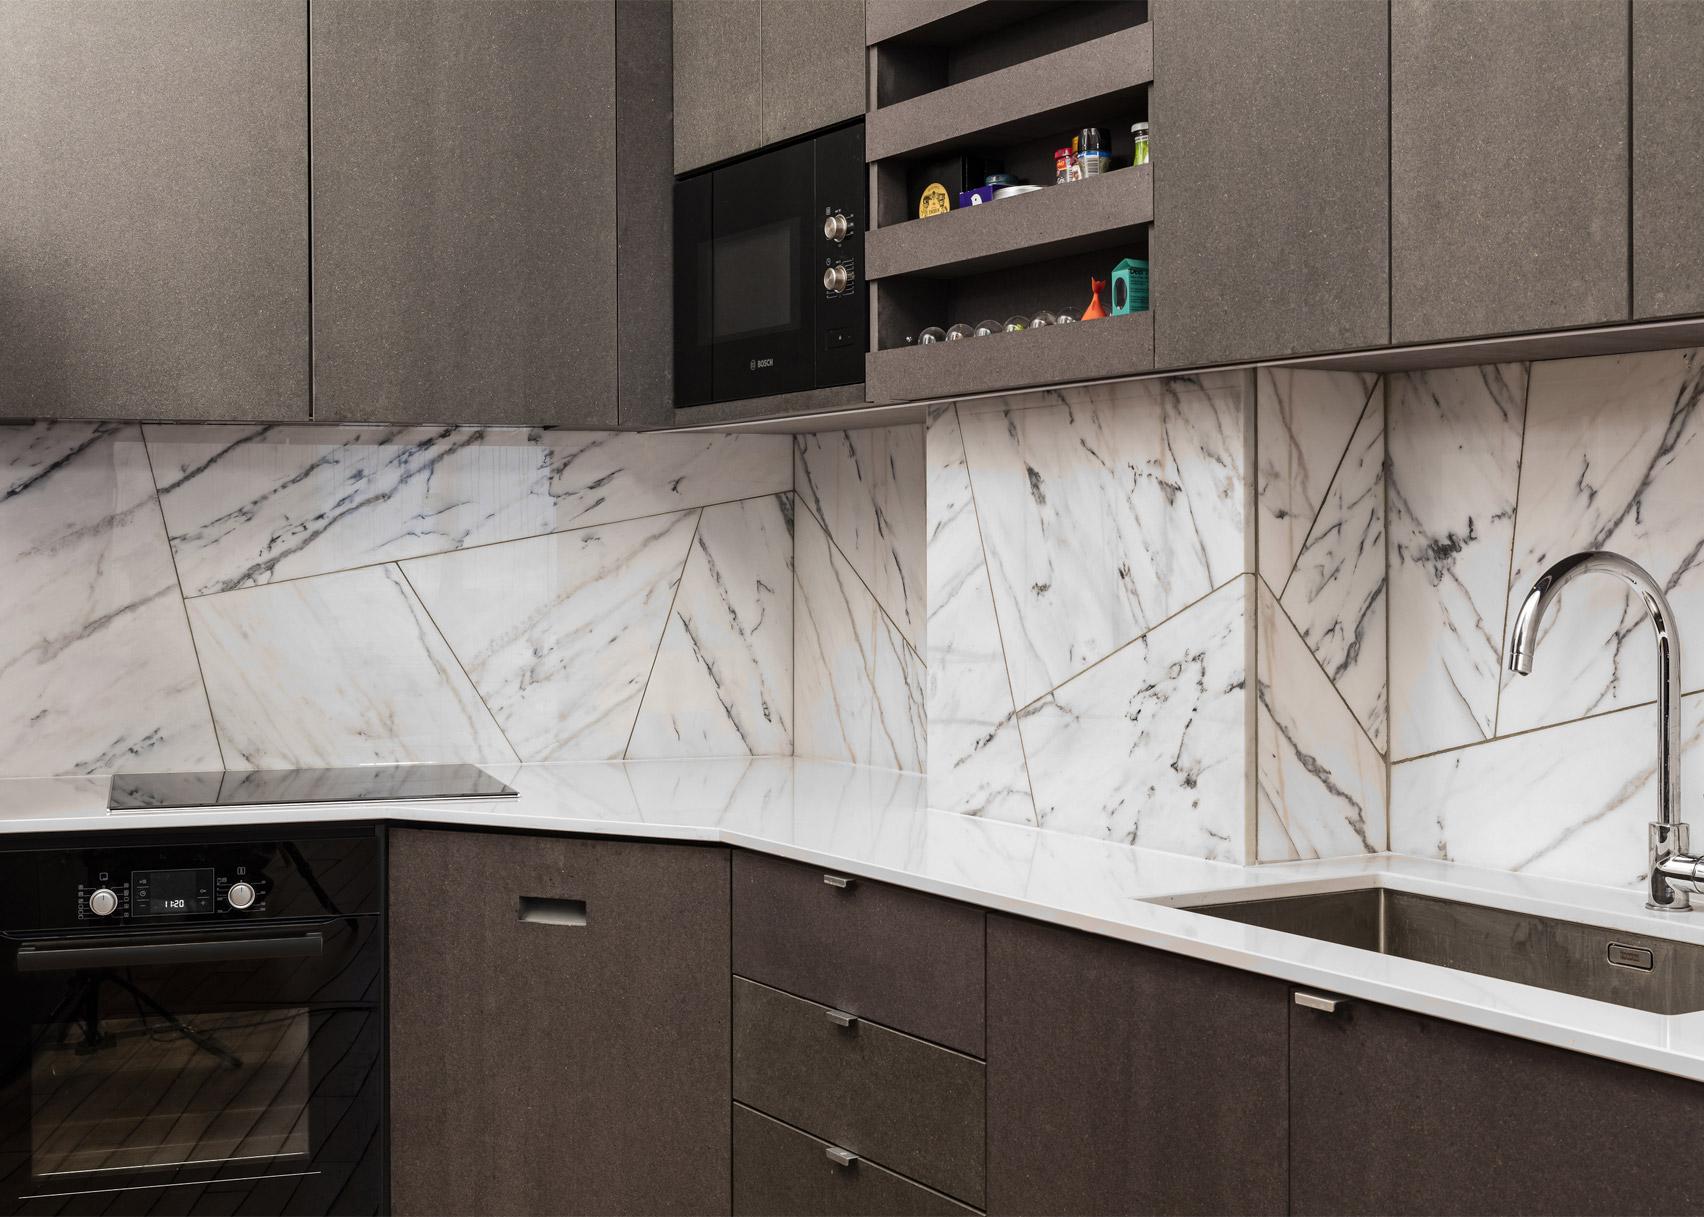 apartment-xiv-studio-razavi-interiors-paris-france-renovation_dezeen_1704_ss_2